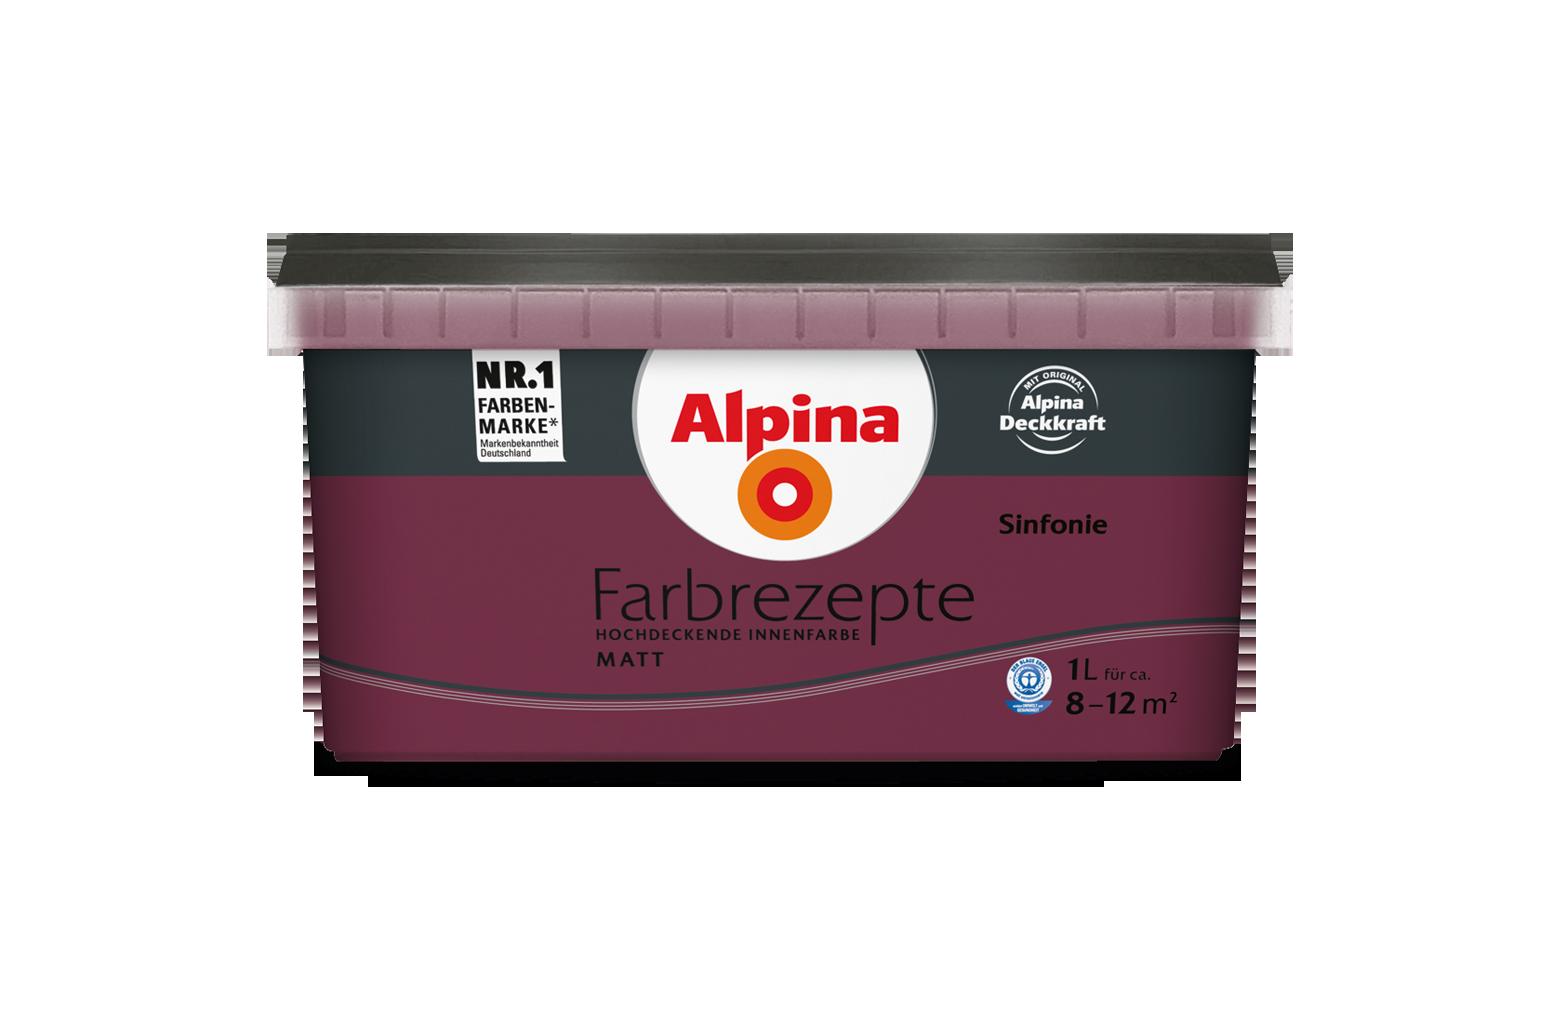 innenfarbe in bordeaux rot streichen alpina farbrezepte sinfonie alpina farben. Black Bedroom Furniture Sets. Home Design Ideas